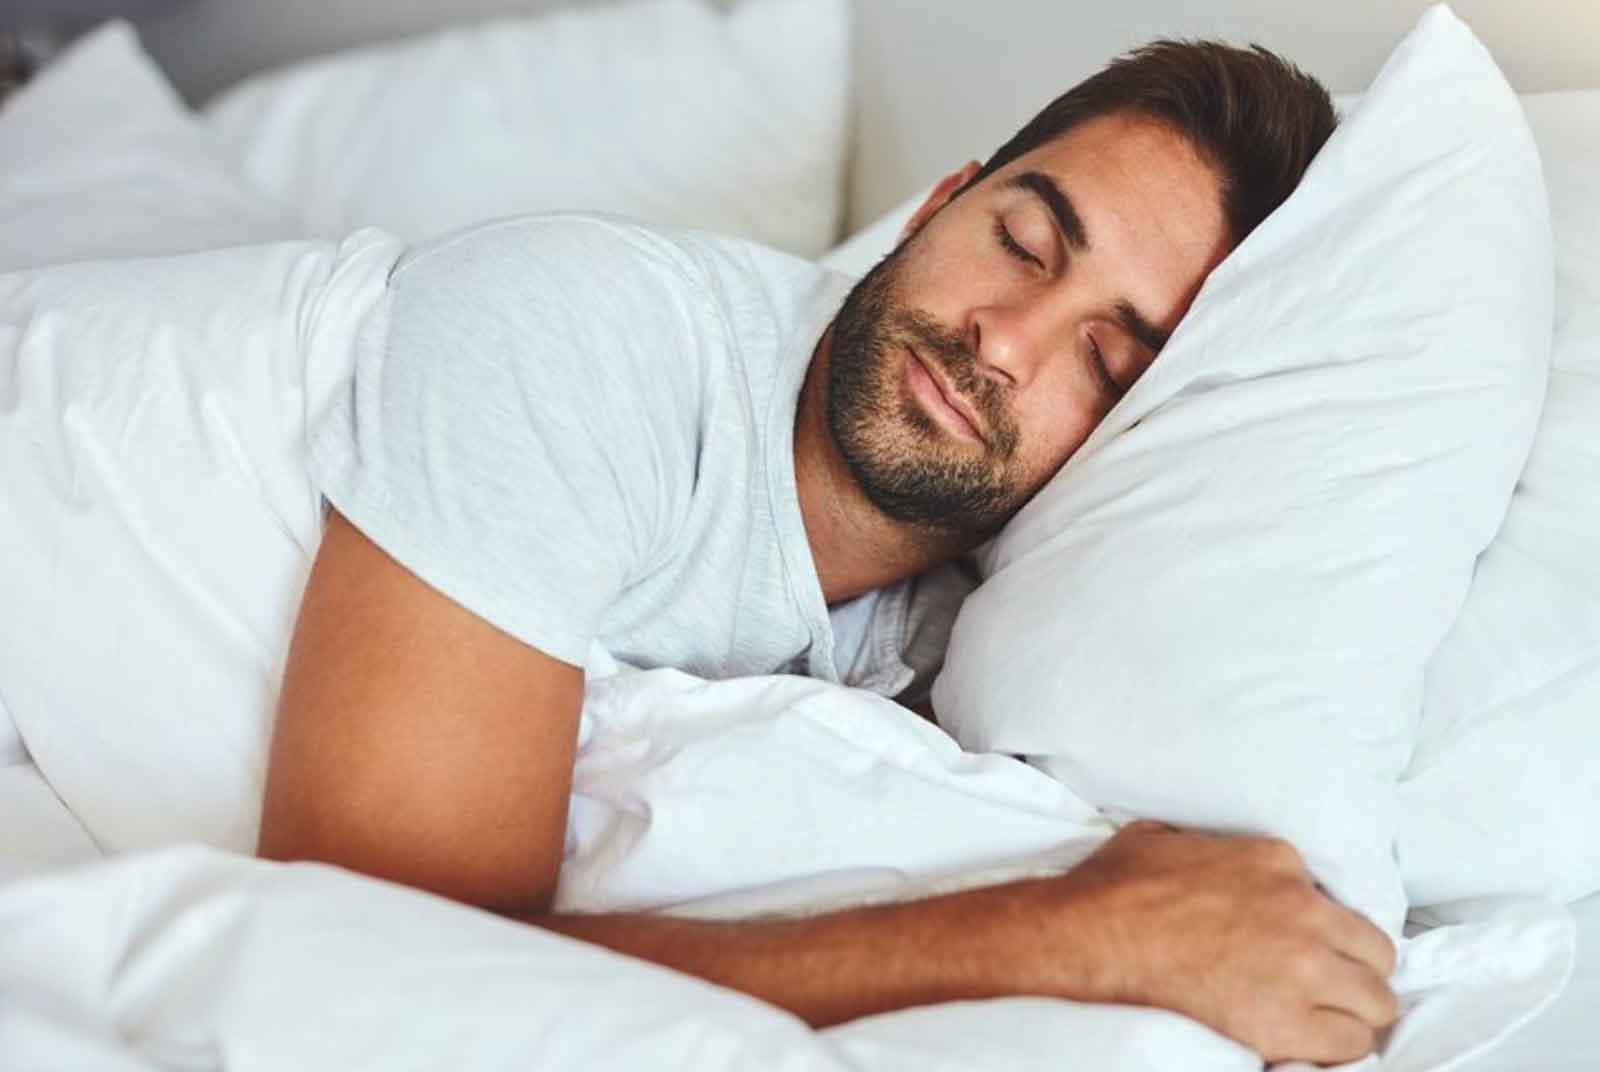 Gezond slapen, hoe pak je dat aan?